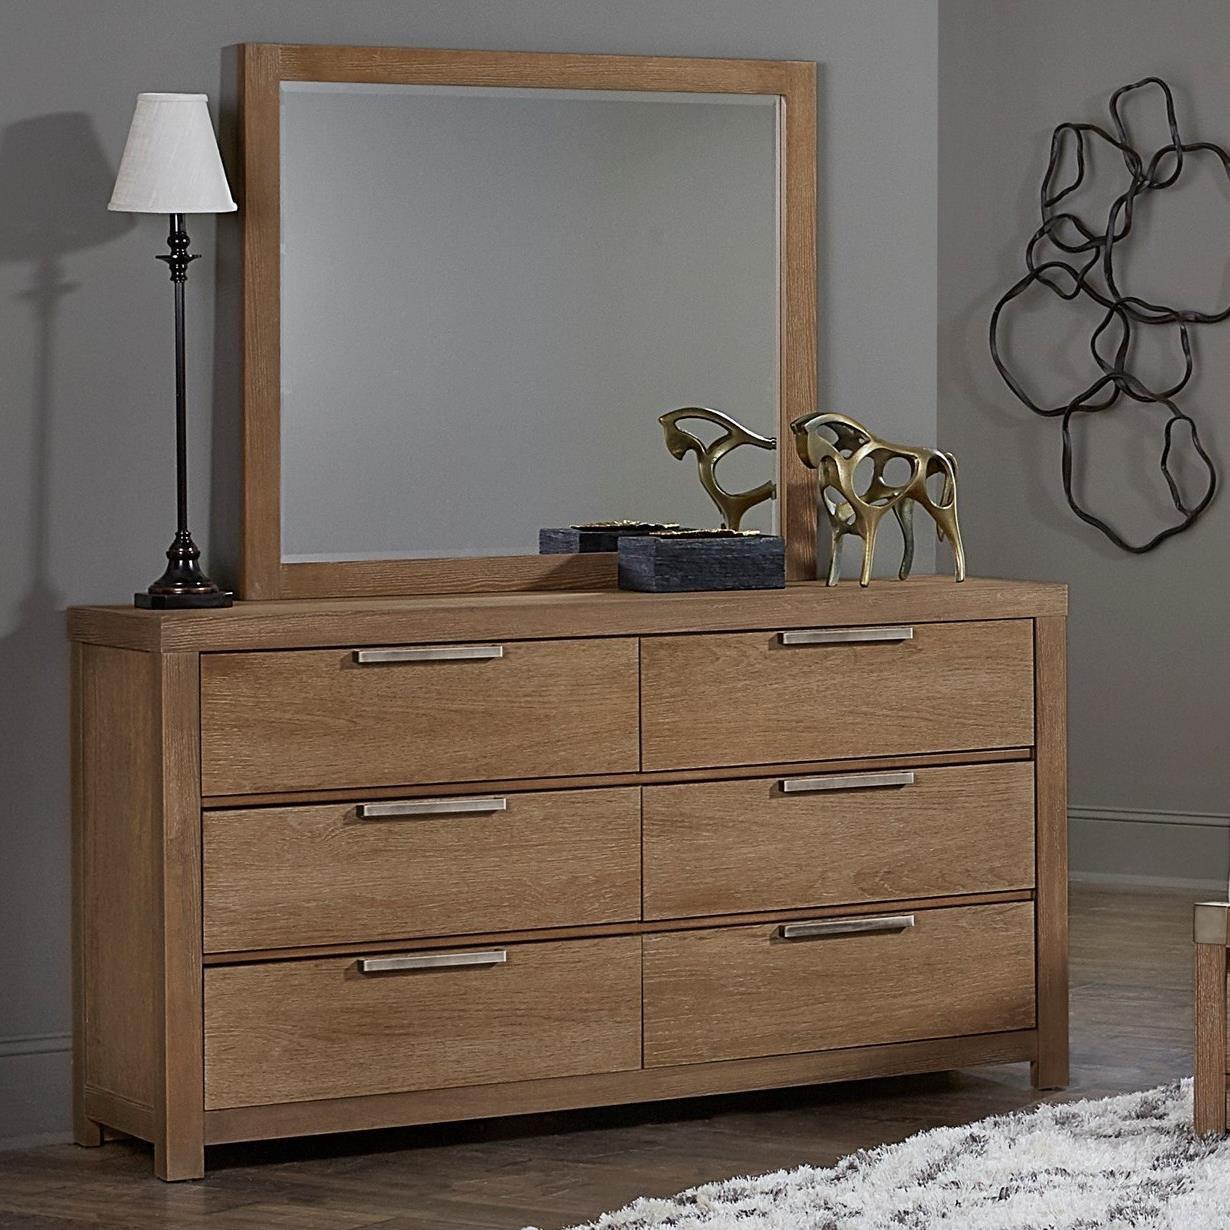 Vaughan Bassett American Modern Dresser & Landscape Mirror - Item Number: 652-002+446